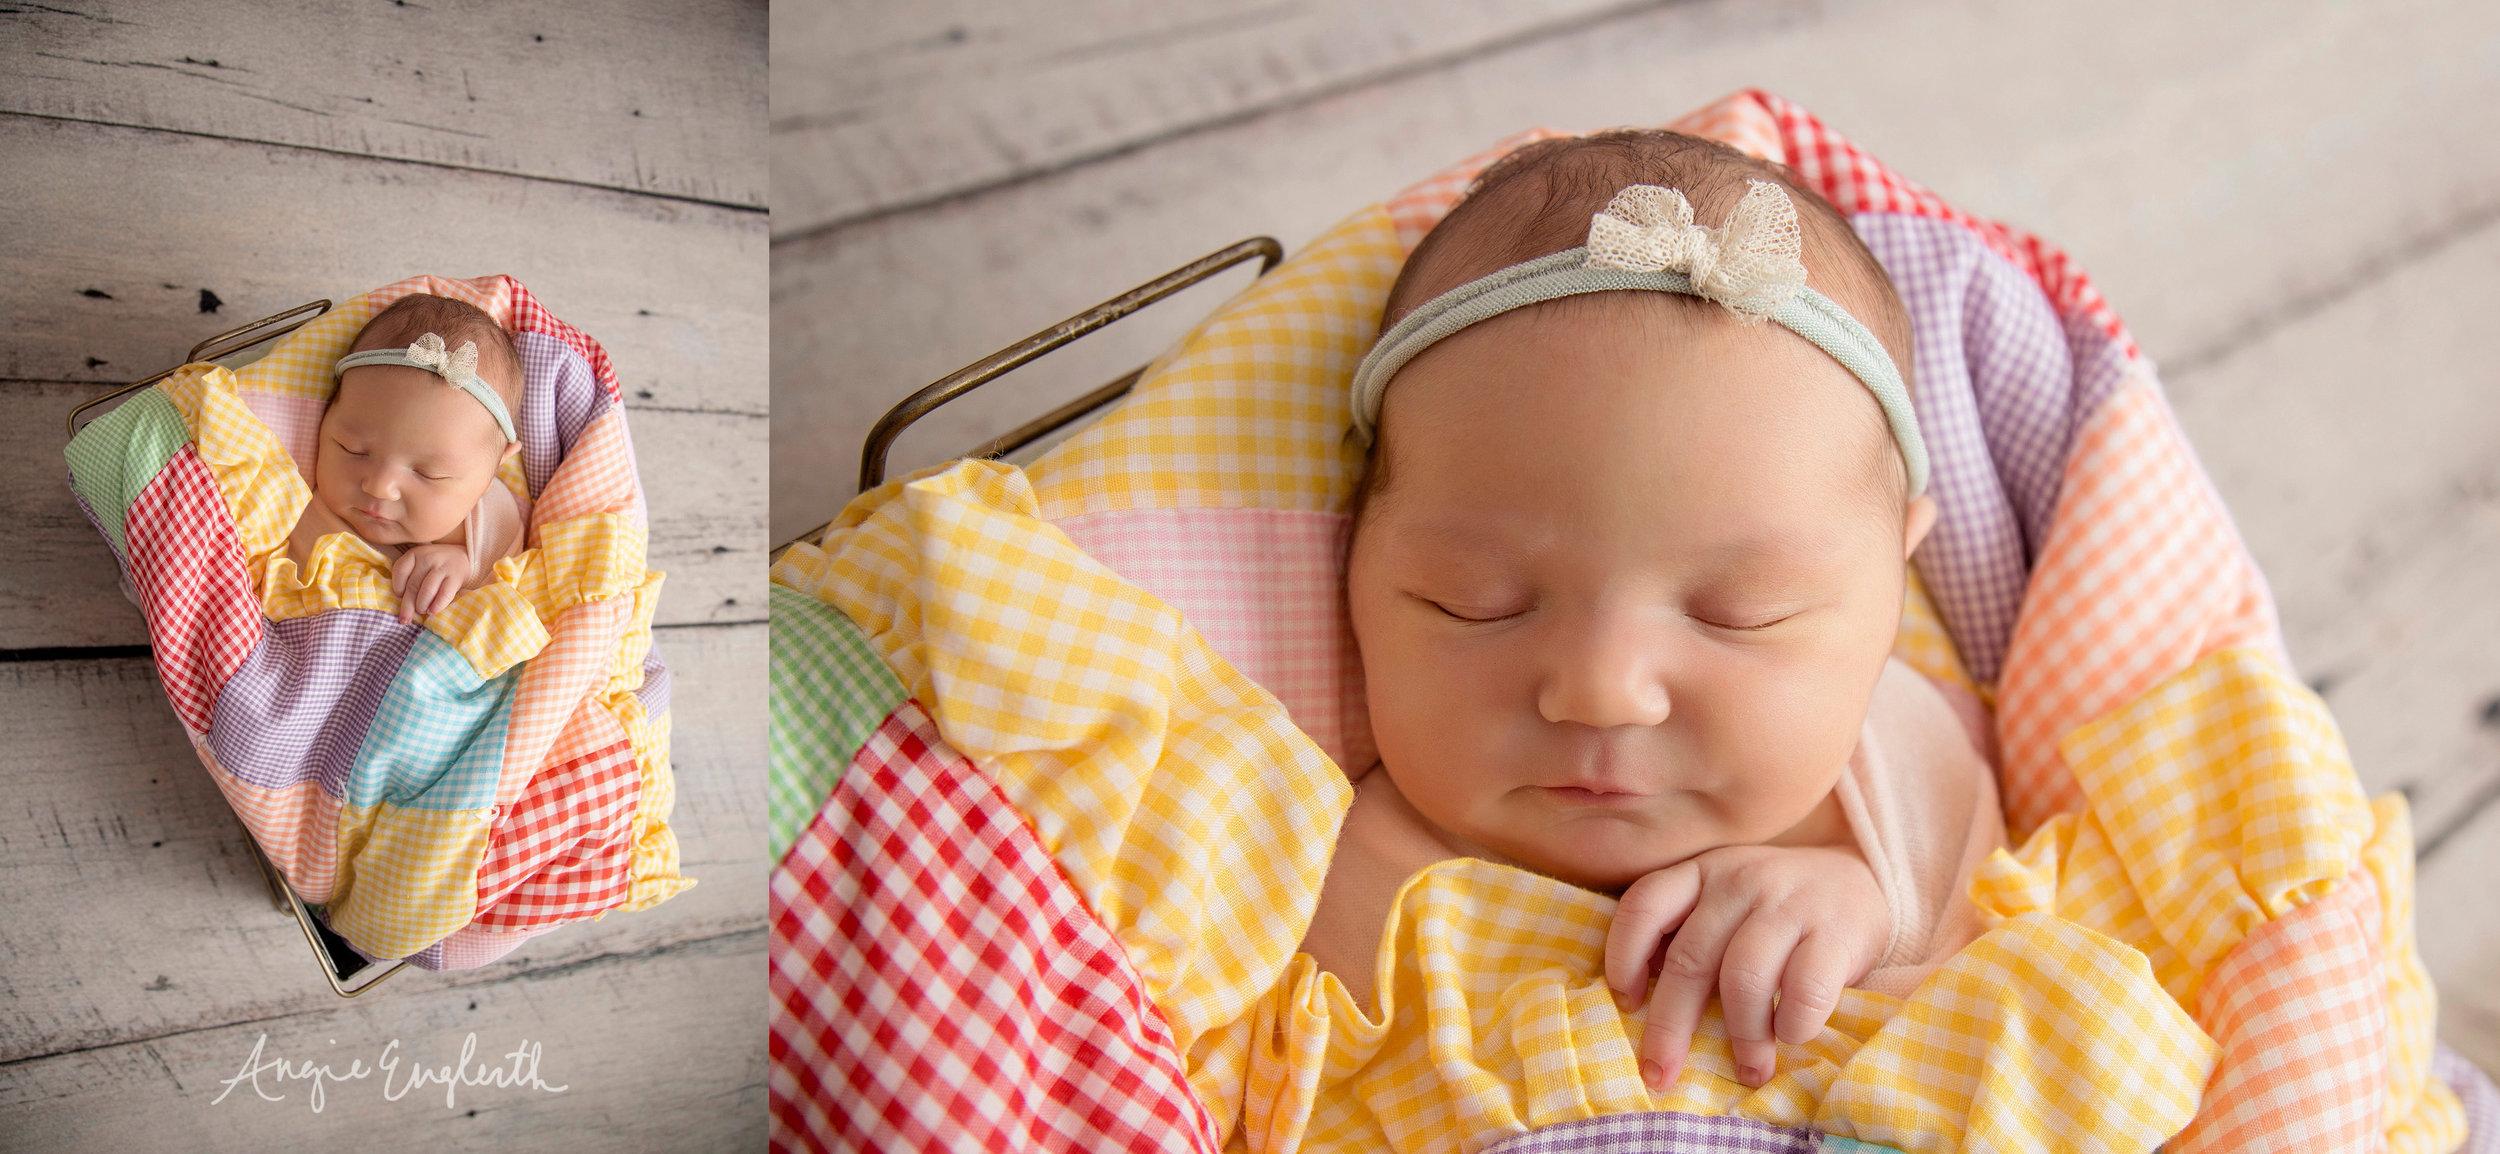 lancaster_newborn_photographer_angie_englerth_central_pa_005.jpg